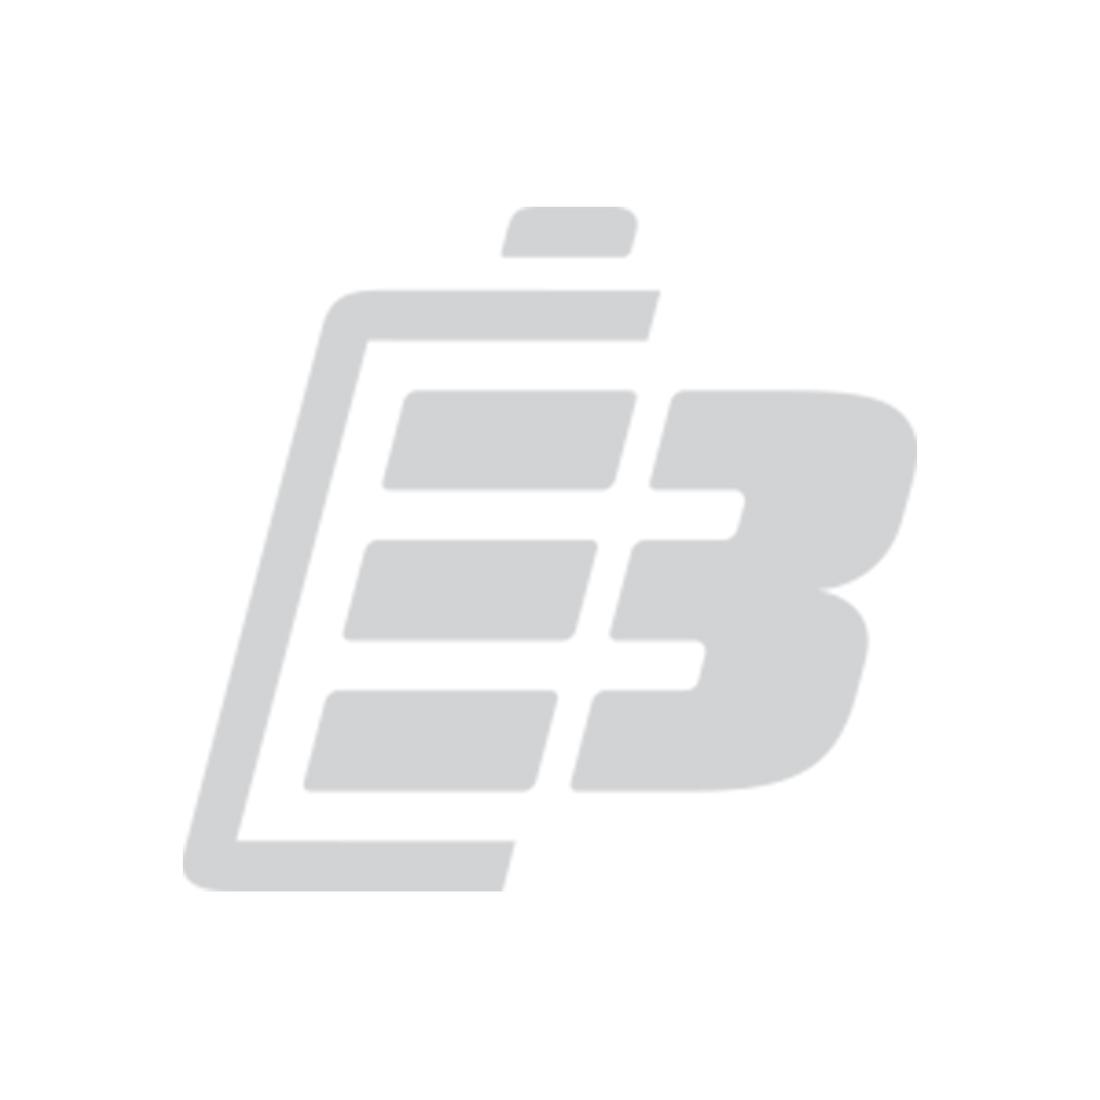 Sony IMR 18650 VTC6 battery 3000mah 30A 1